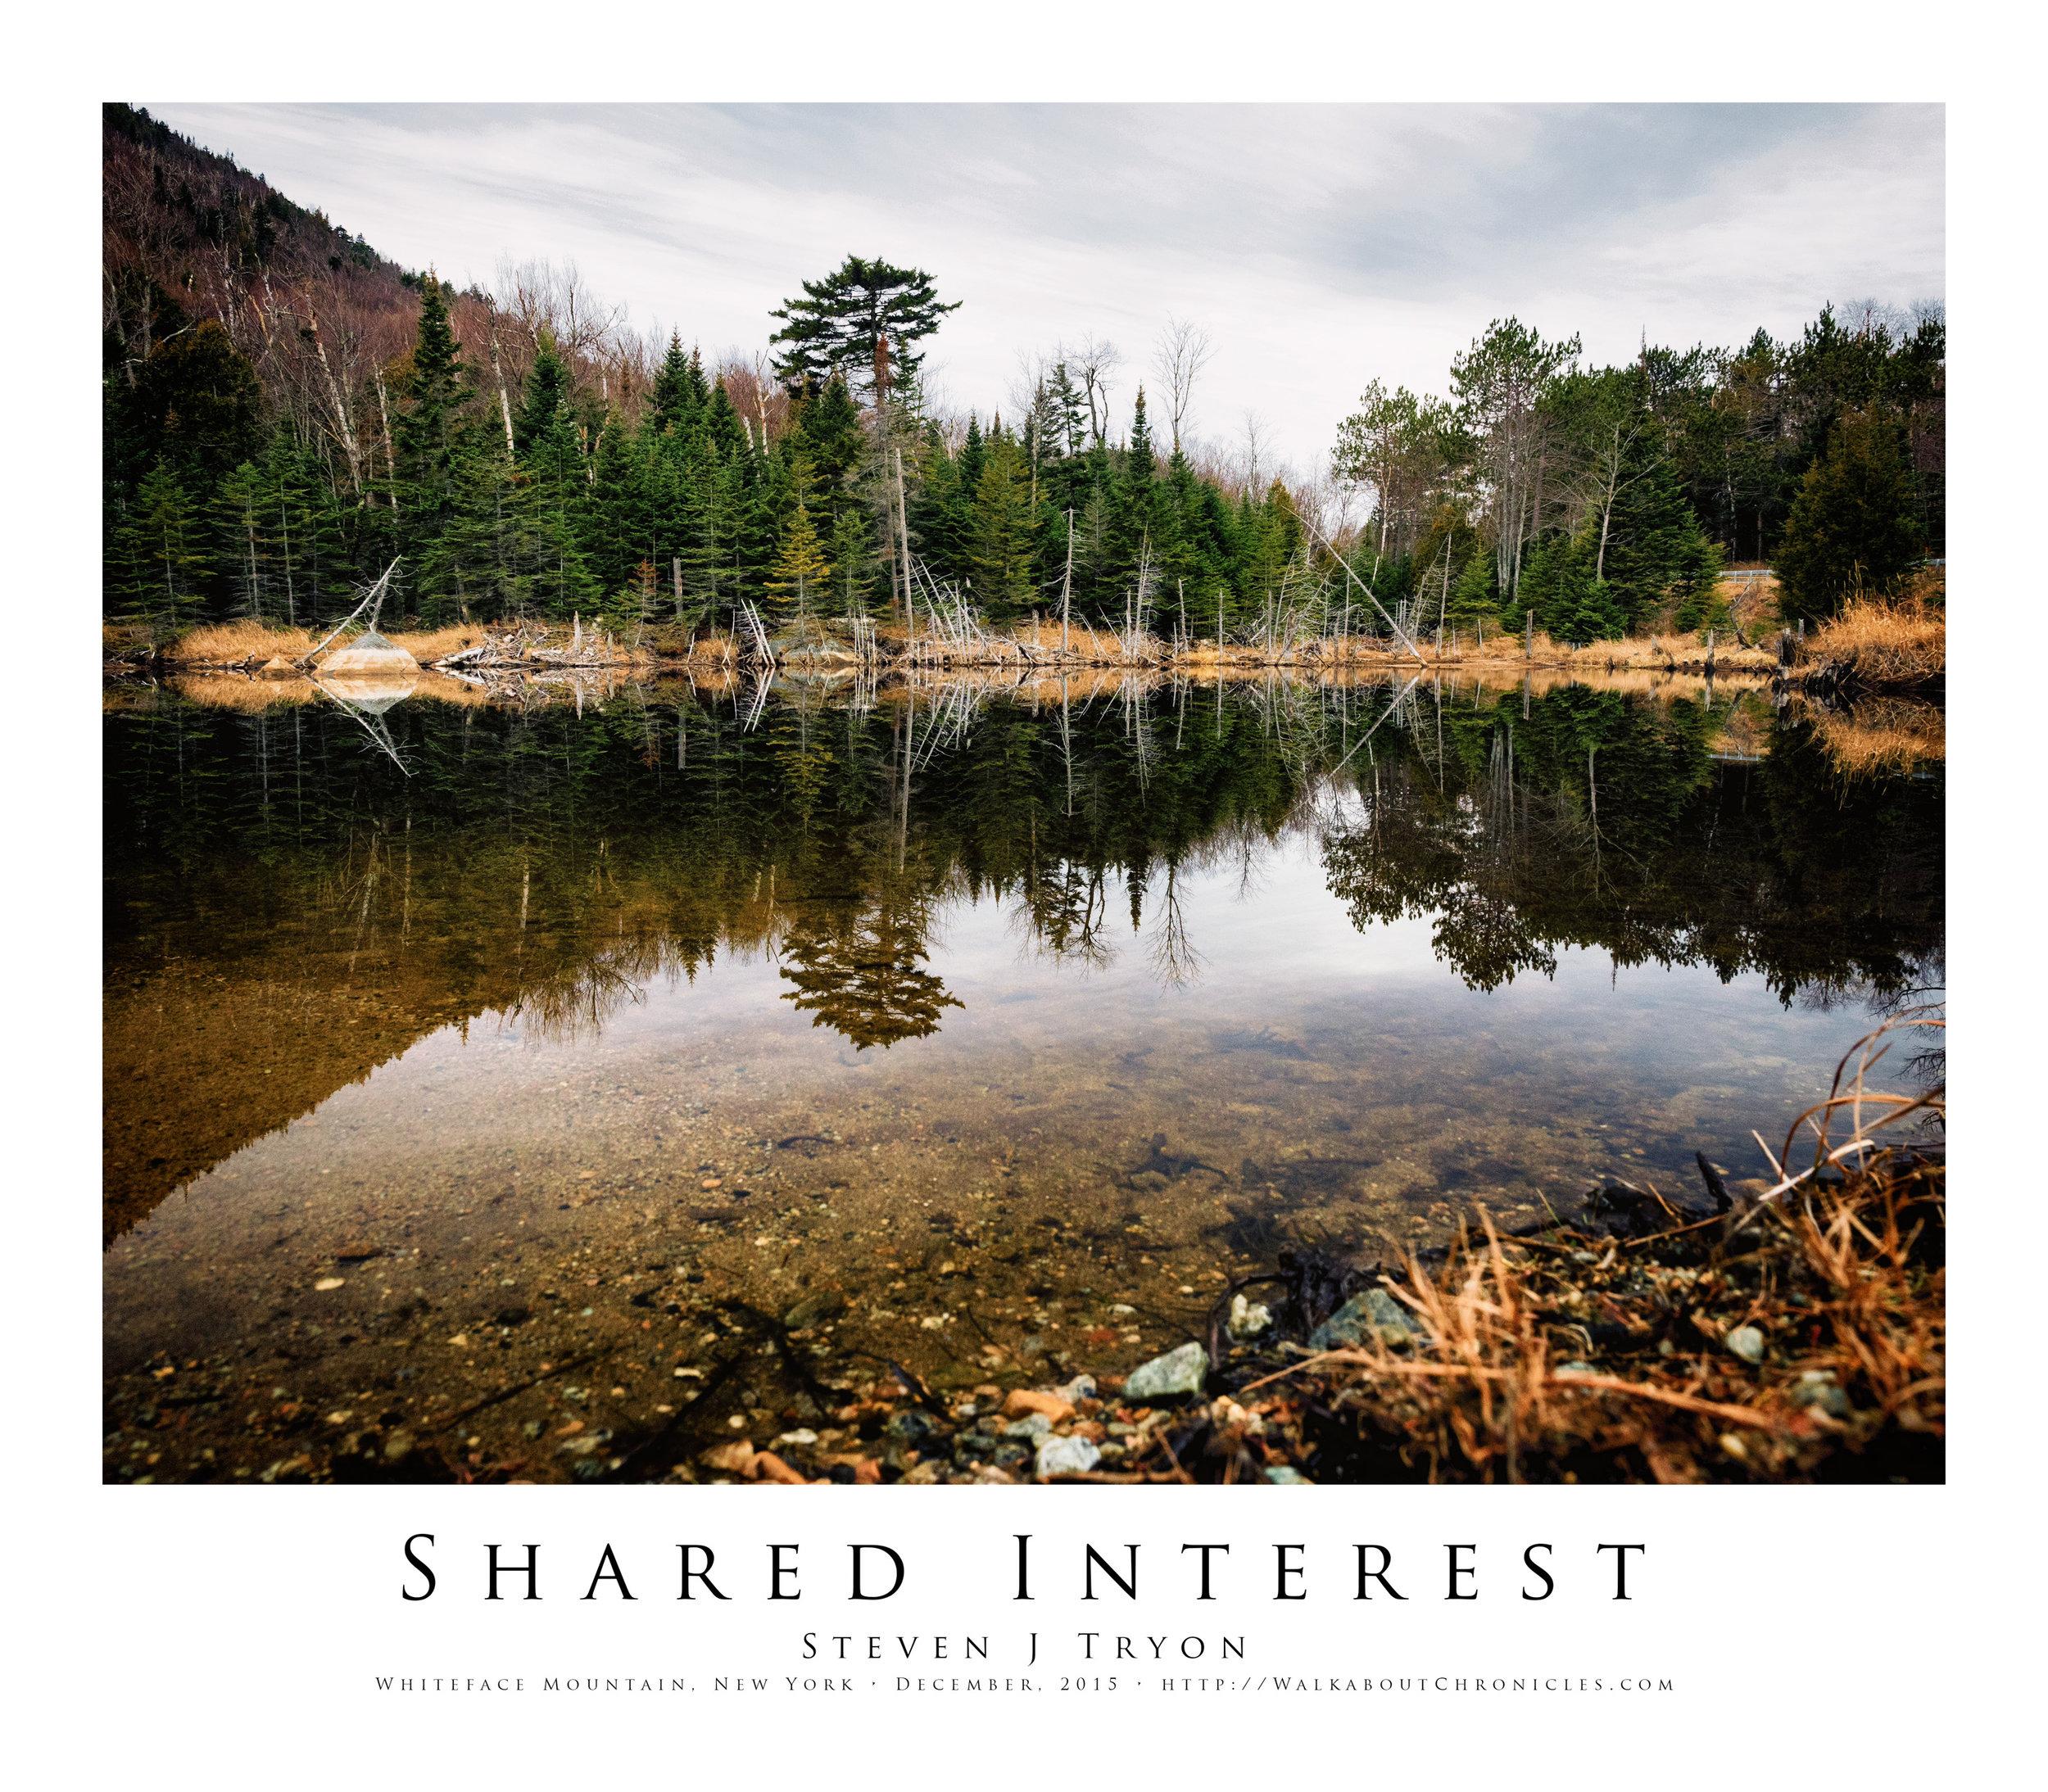 Shared Interest